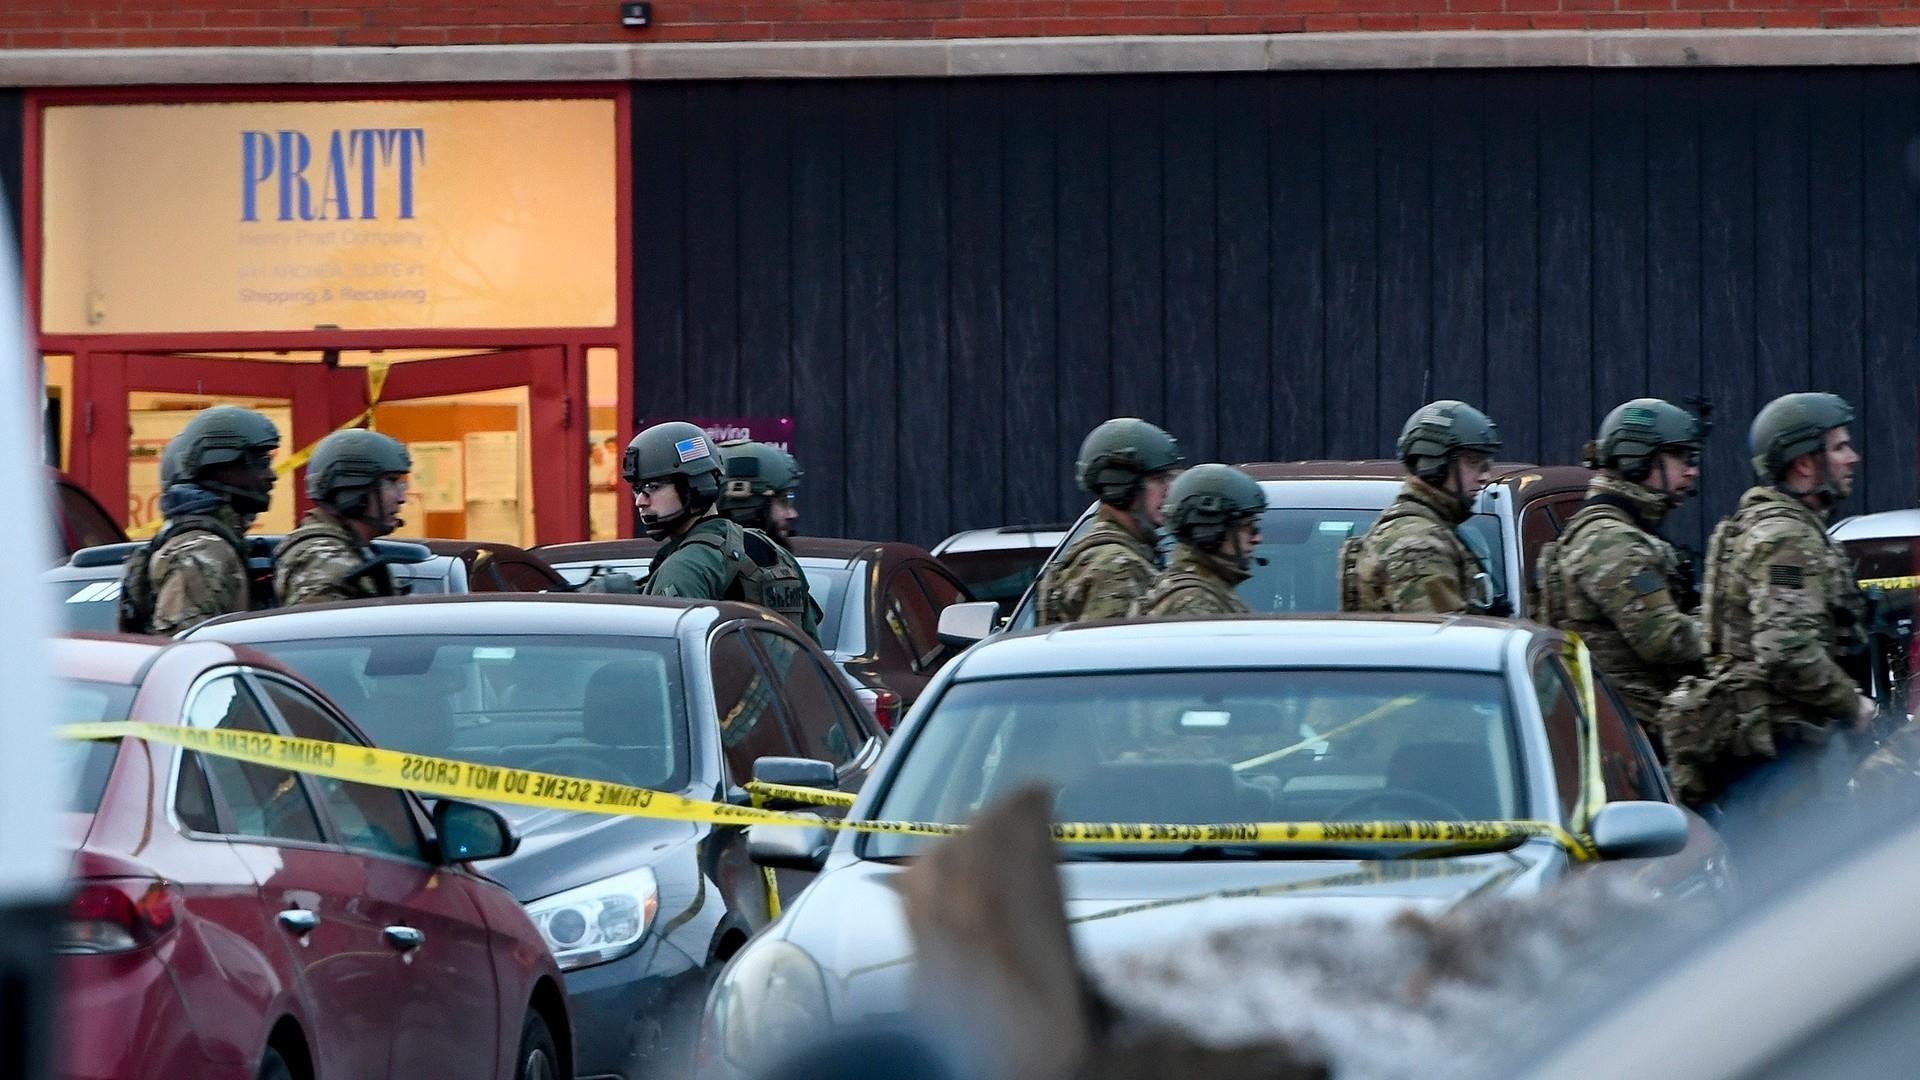 Shooting in Aurora, Illinois leaves 5 dead